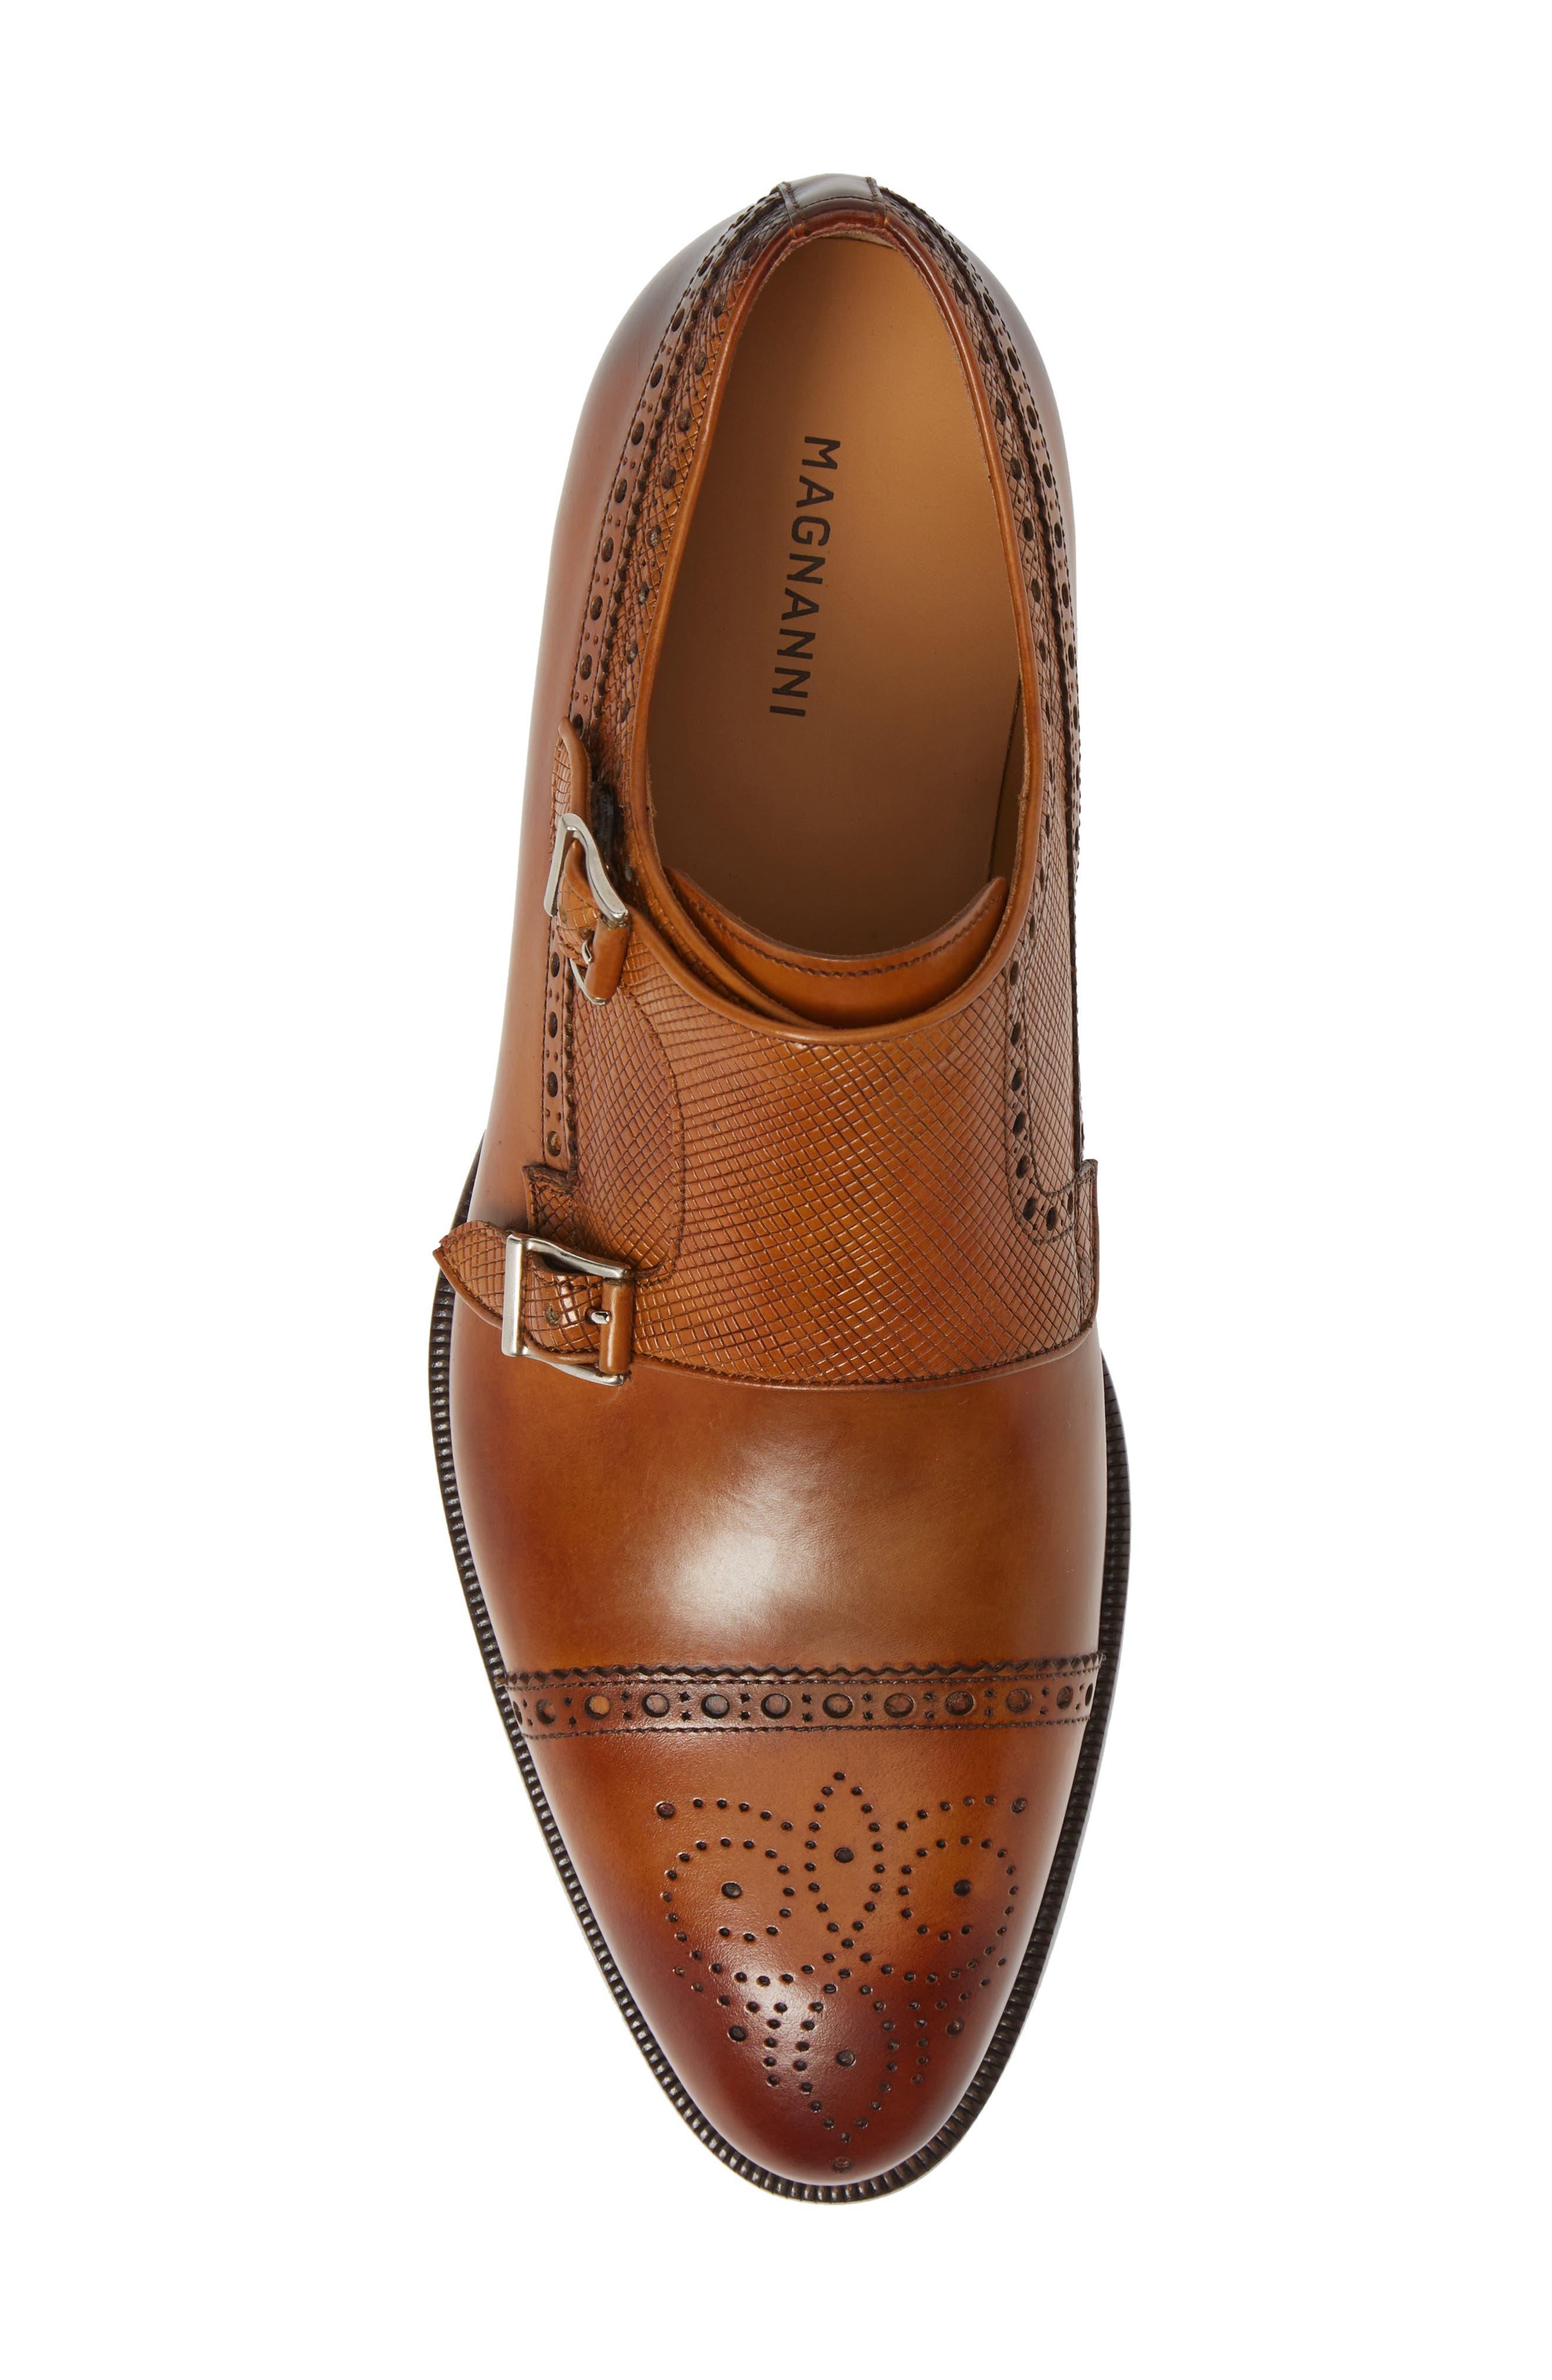 Valda Double Strap Cap Toe Monk Shoe,                             Alternate thumbnail 5, color,                             BROWN LEATHER